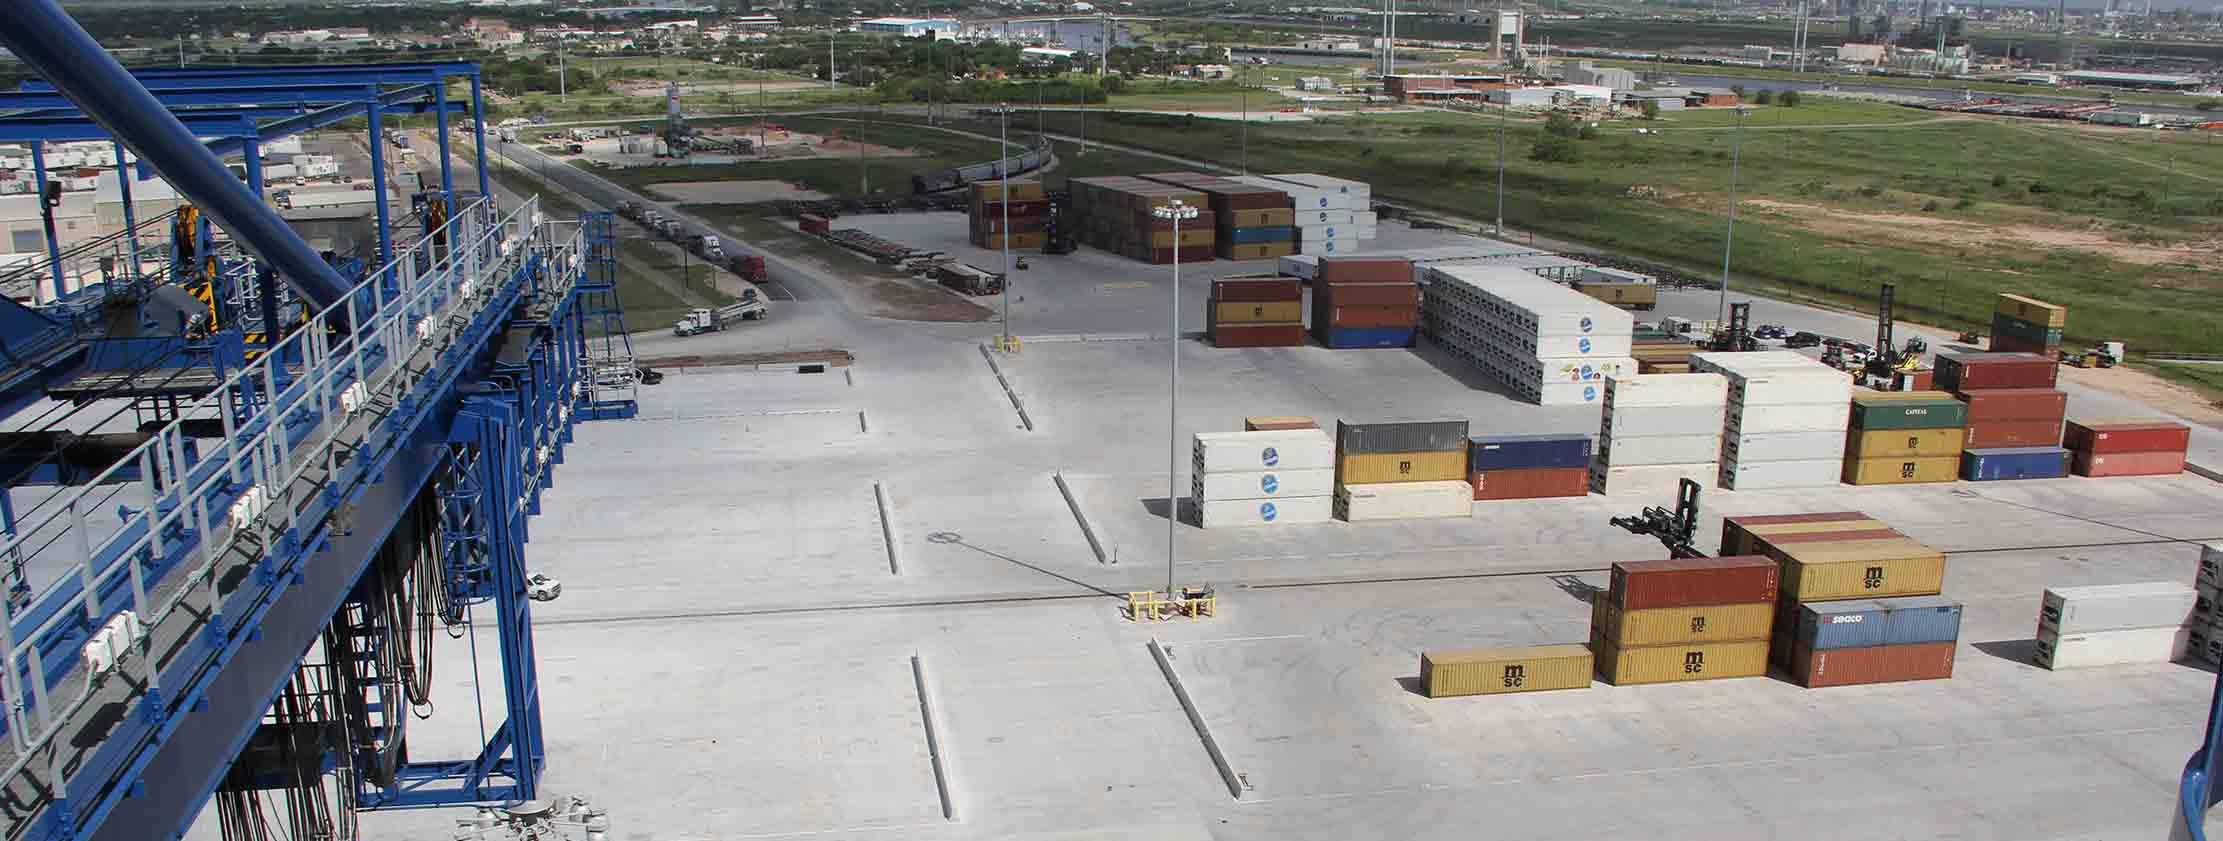 port freeport is expanding